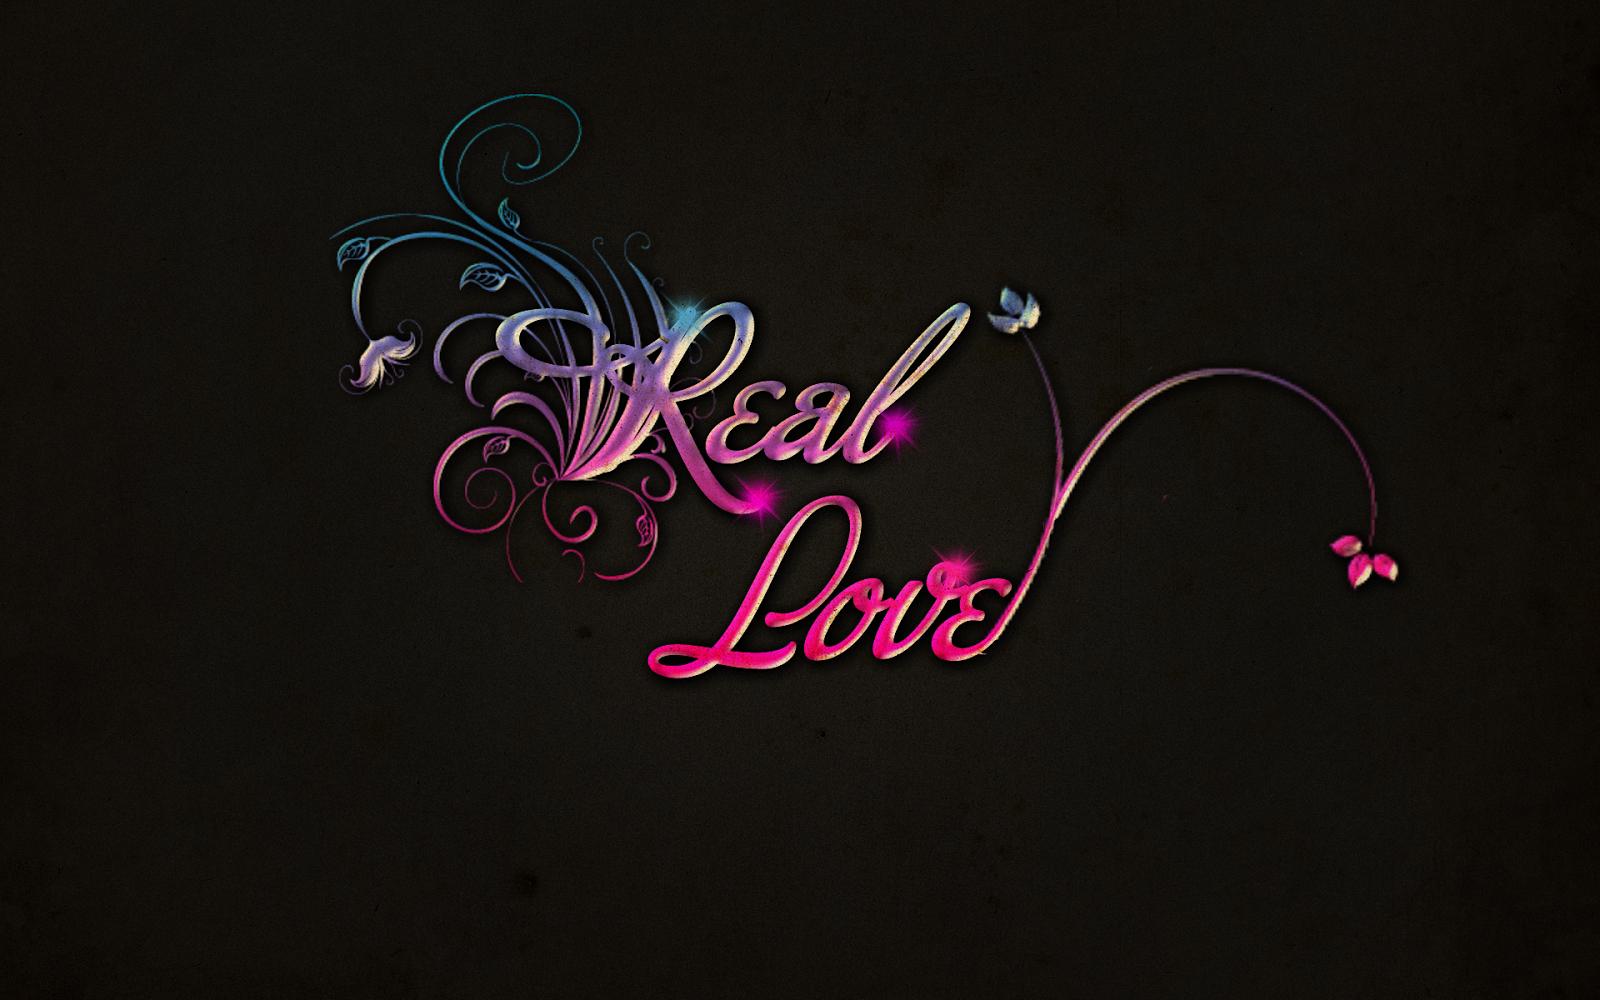 Free true love dating sites